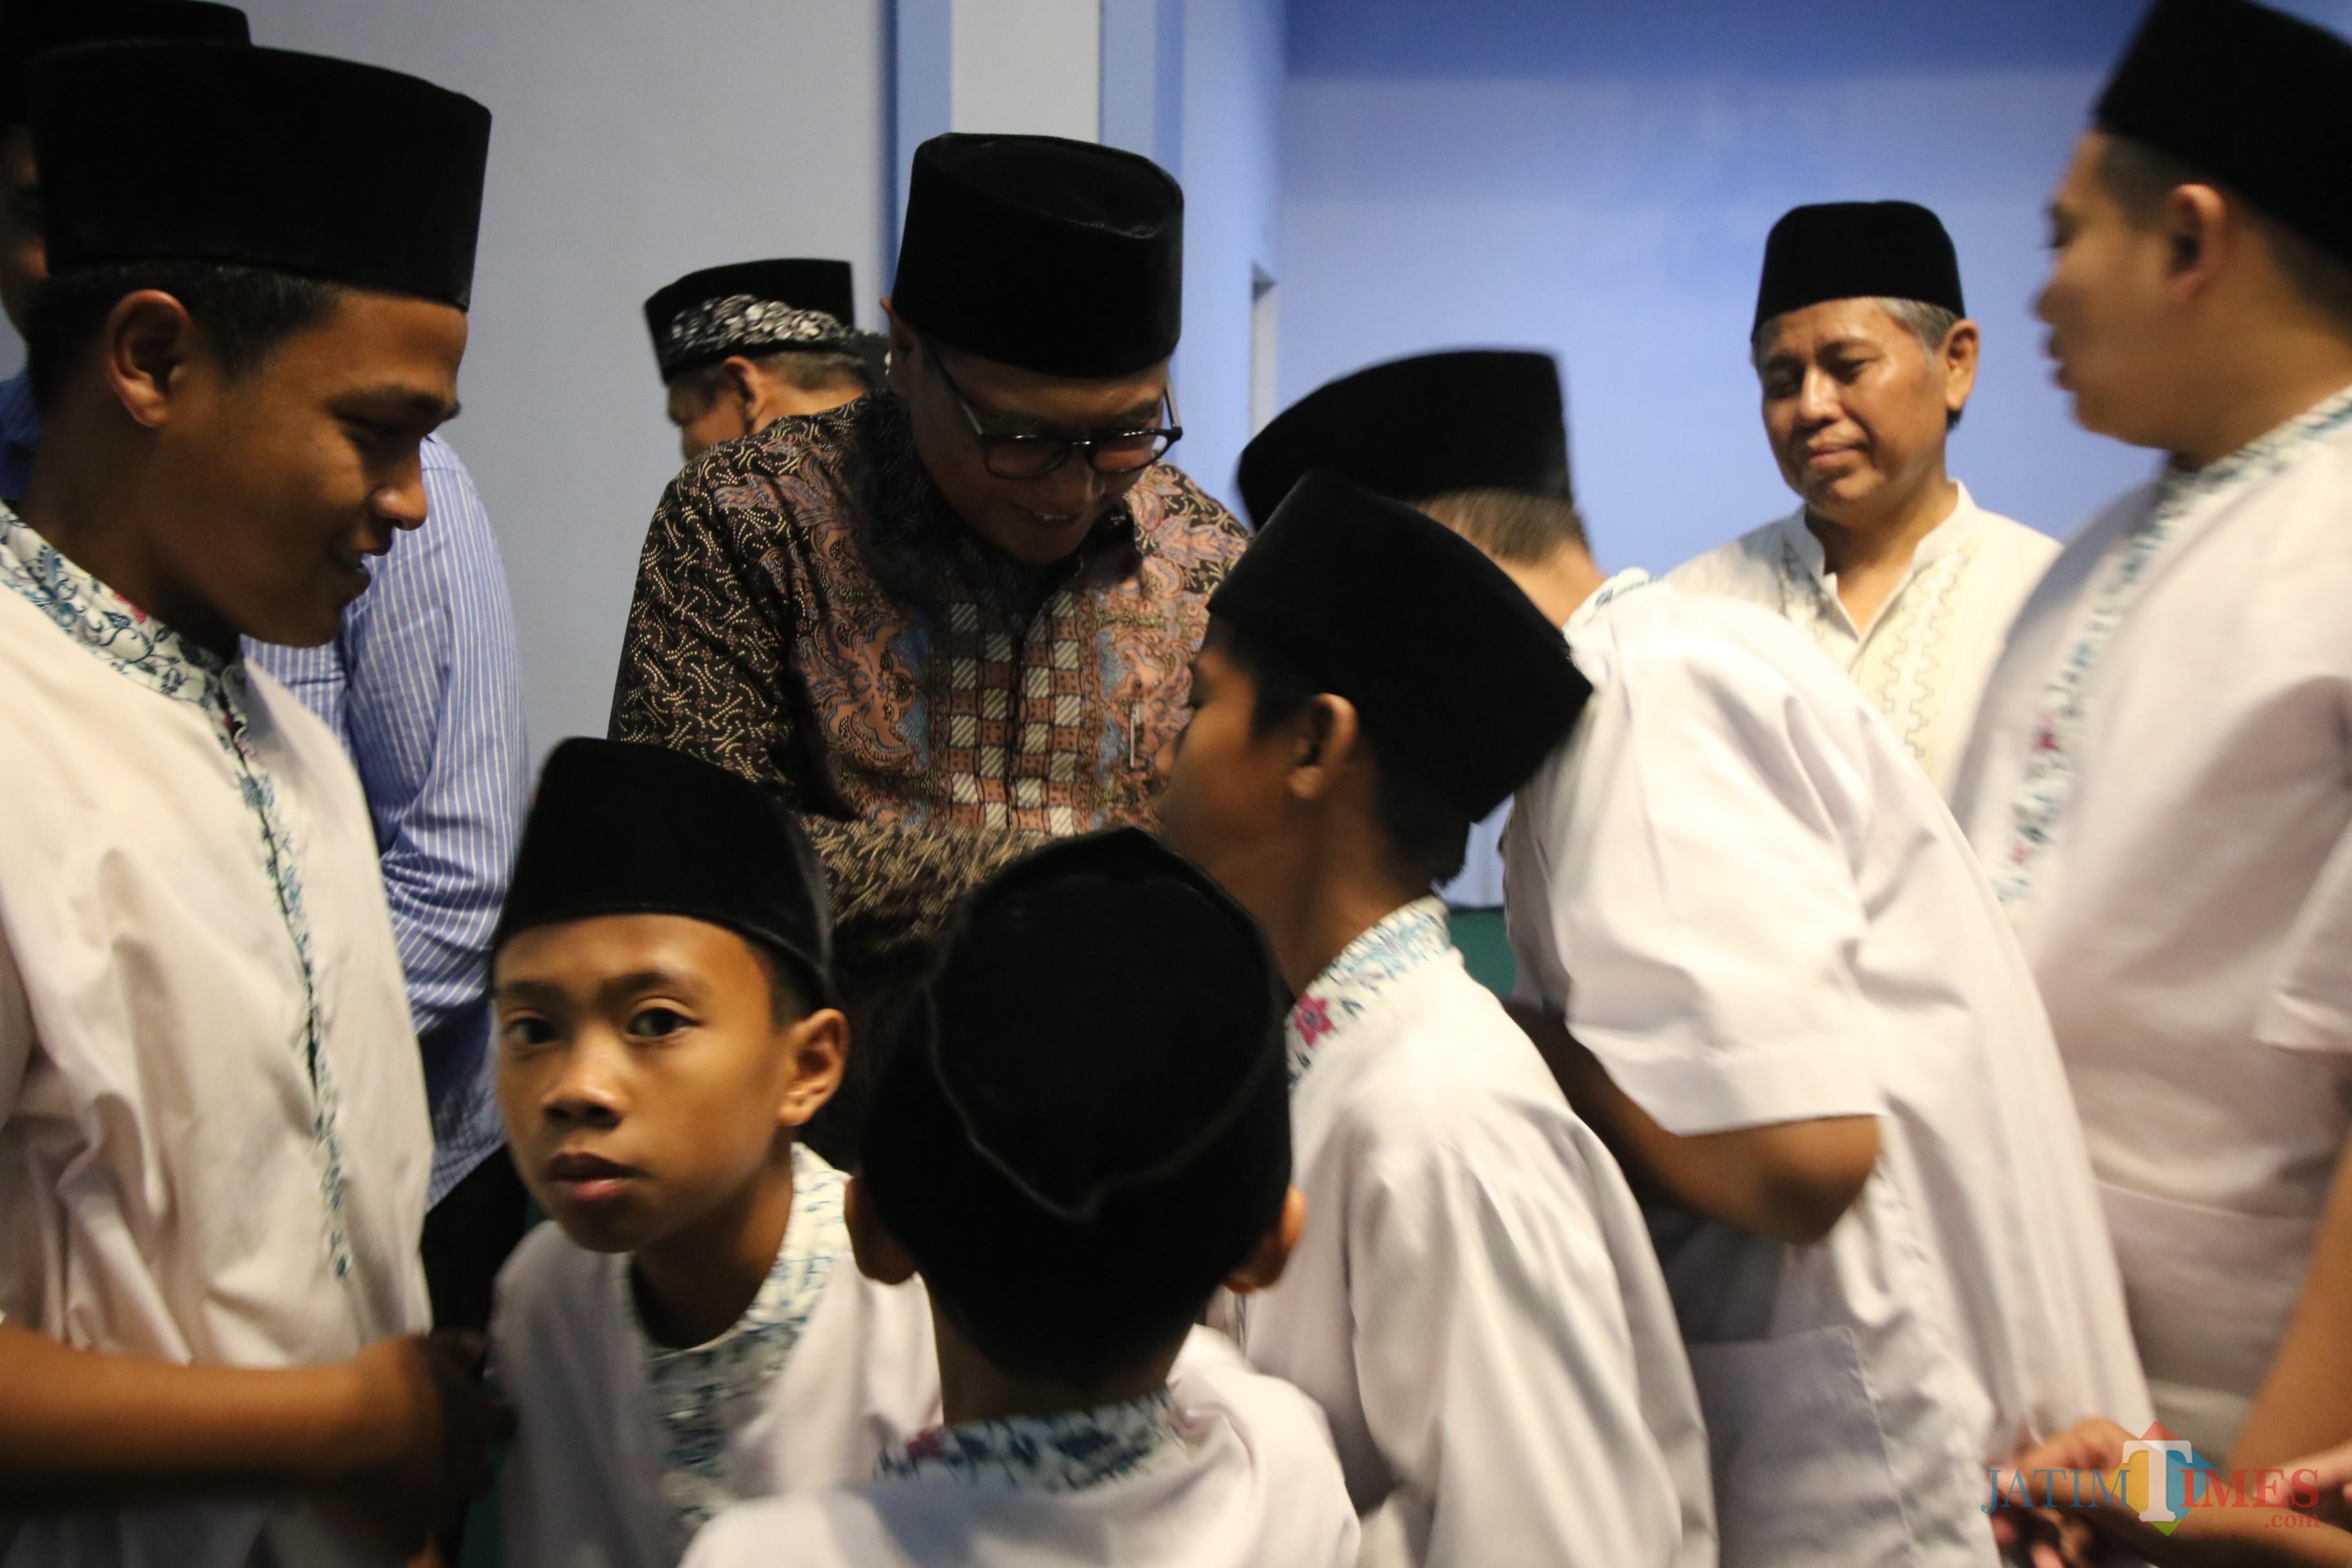 Wakil Wali Kota Malang Sofyan Edi Jarwoko saat bersama anak-anak didik Panti Asuhan Muhammadiyah di sela agenda Safari Ramadan. (Foto: Nurlayla Ratri/MalangTIMES)